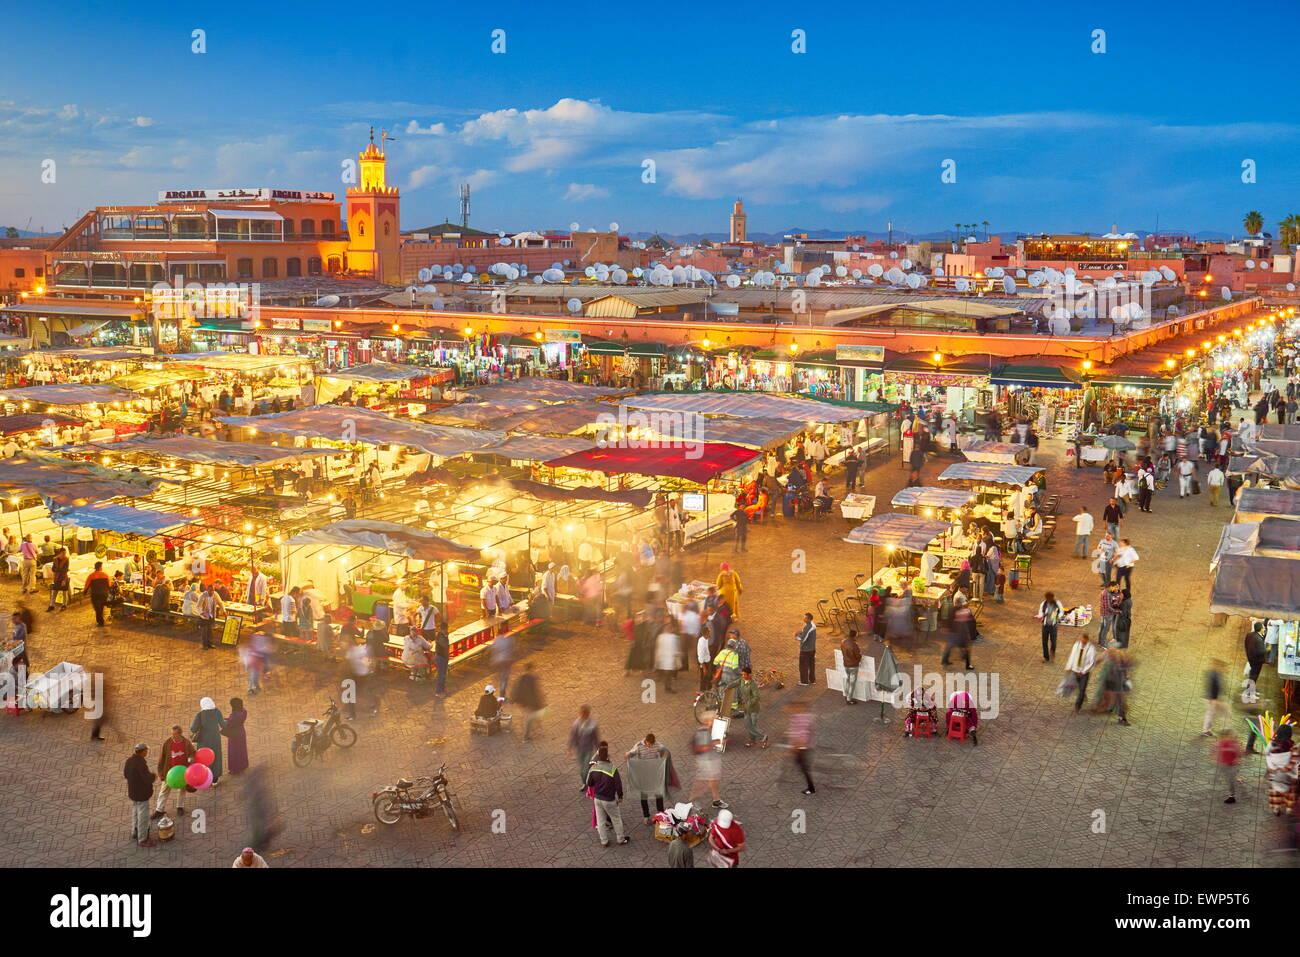 Djemaa el Fna al crepuscolo, Medina di Marrakech, Marocco, Africa Immagini Stock